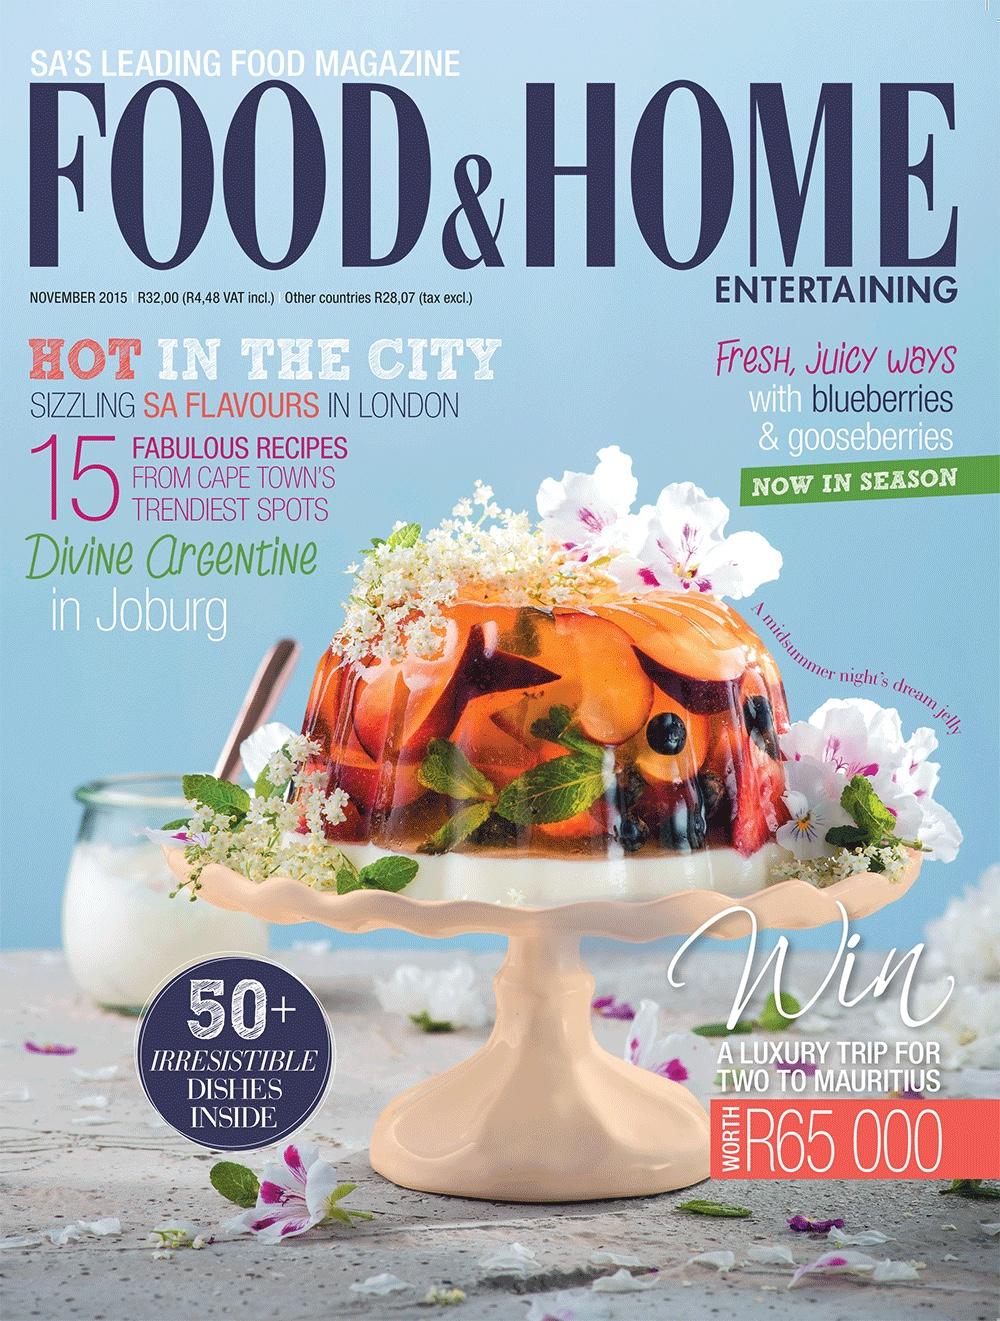 Food & Home Entertainment magazine, November 2015 issue.